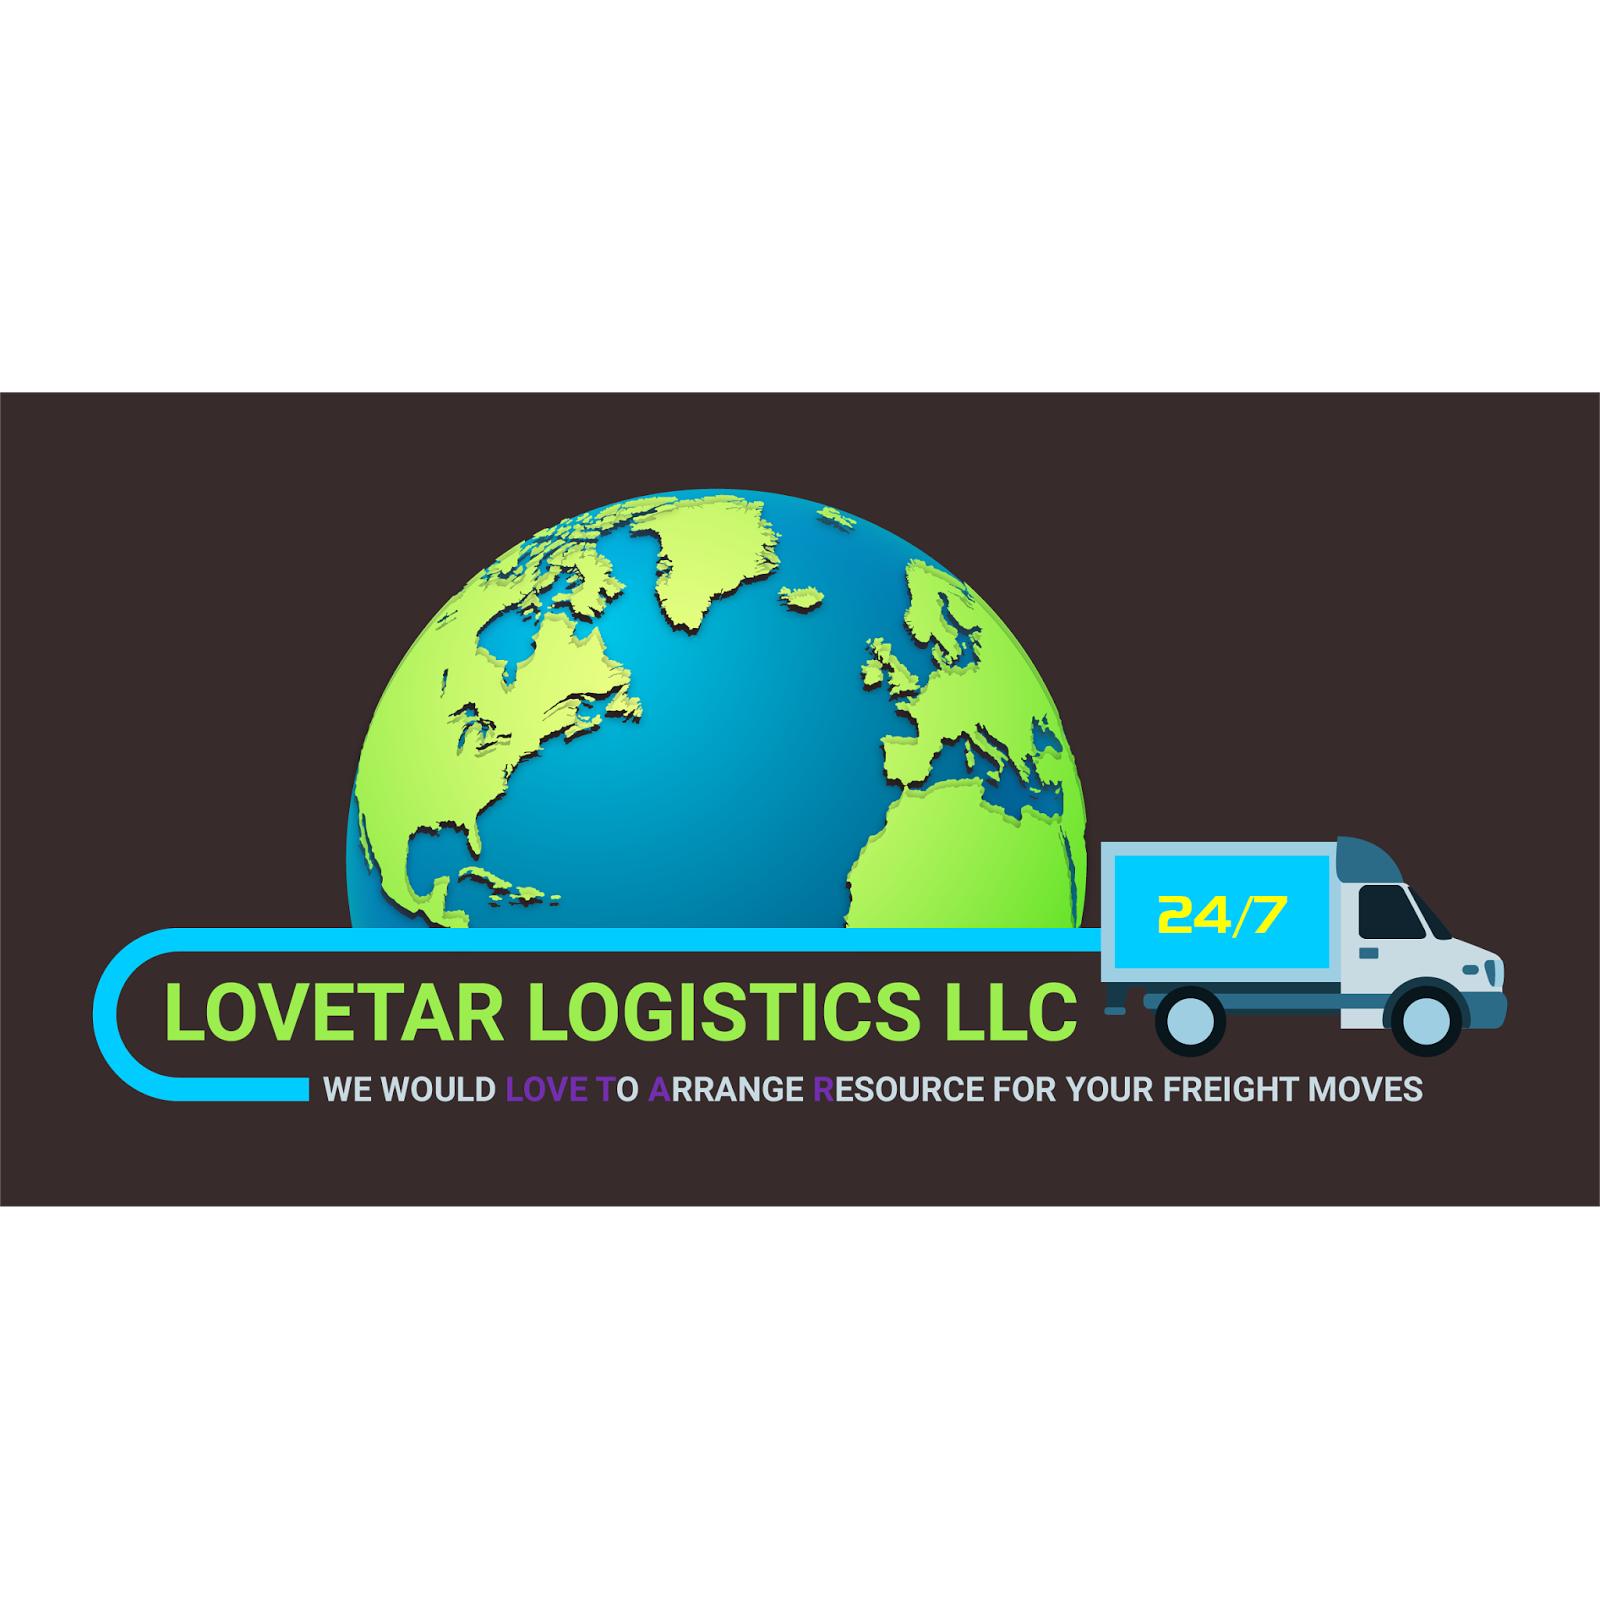 Lovetar Logistics LLC